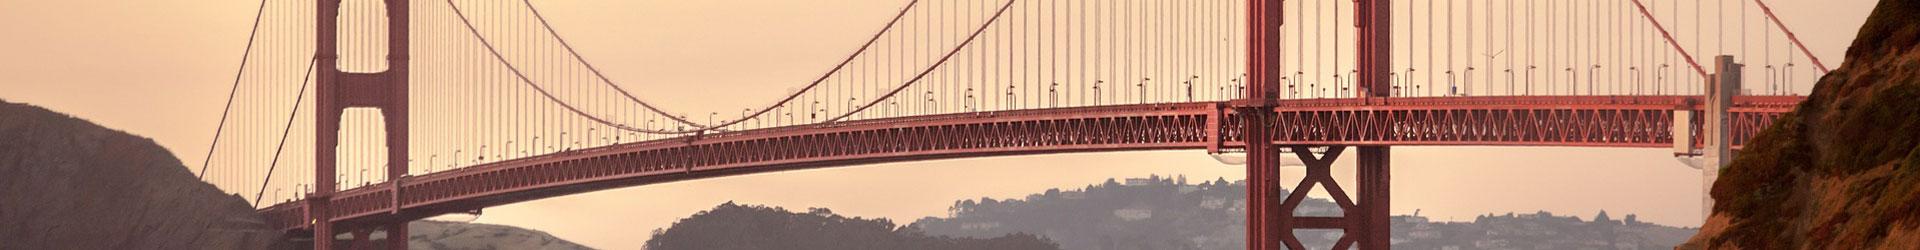 golden-gate-bridge_web